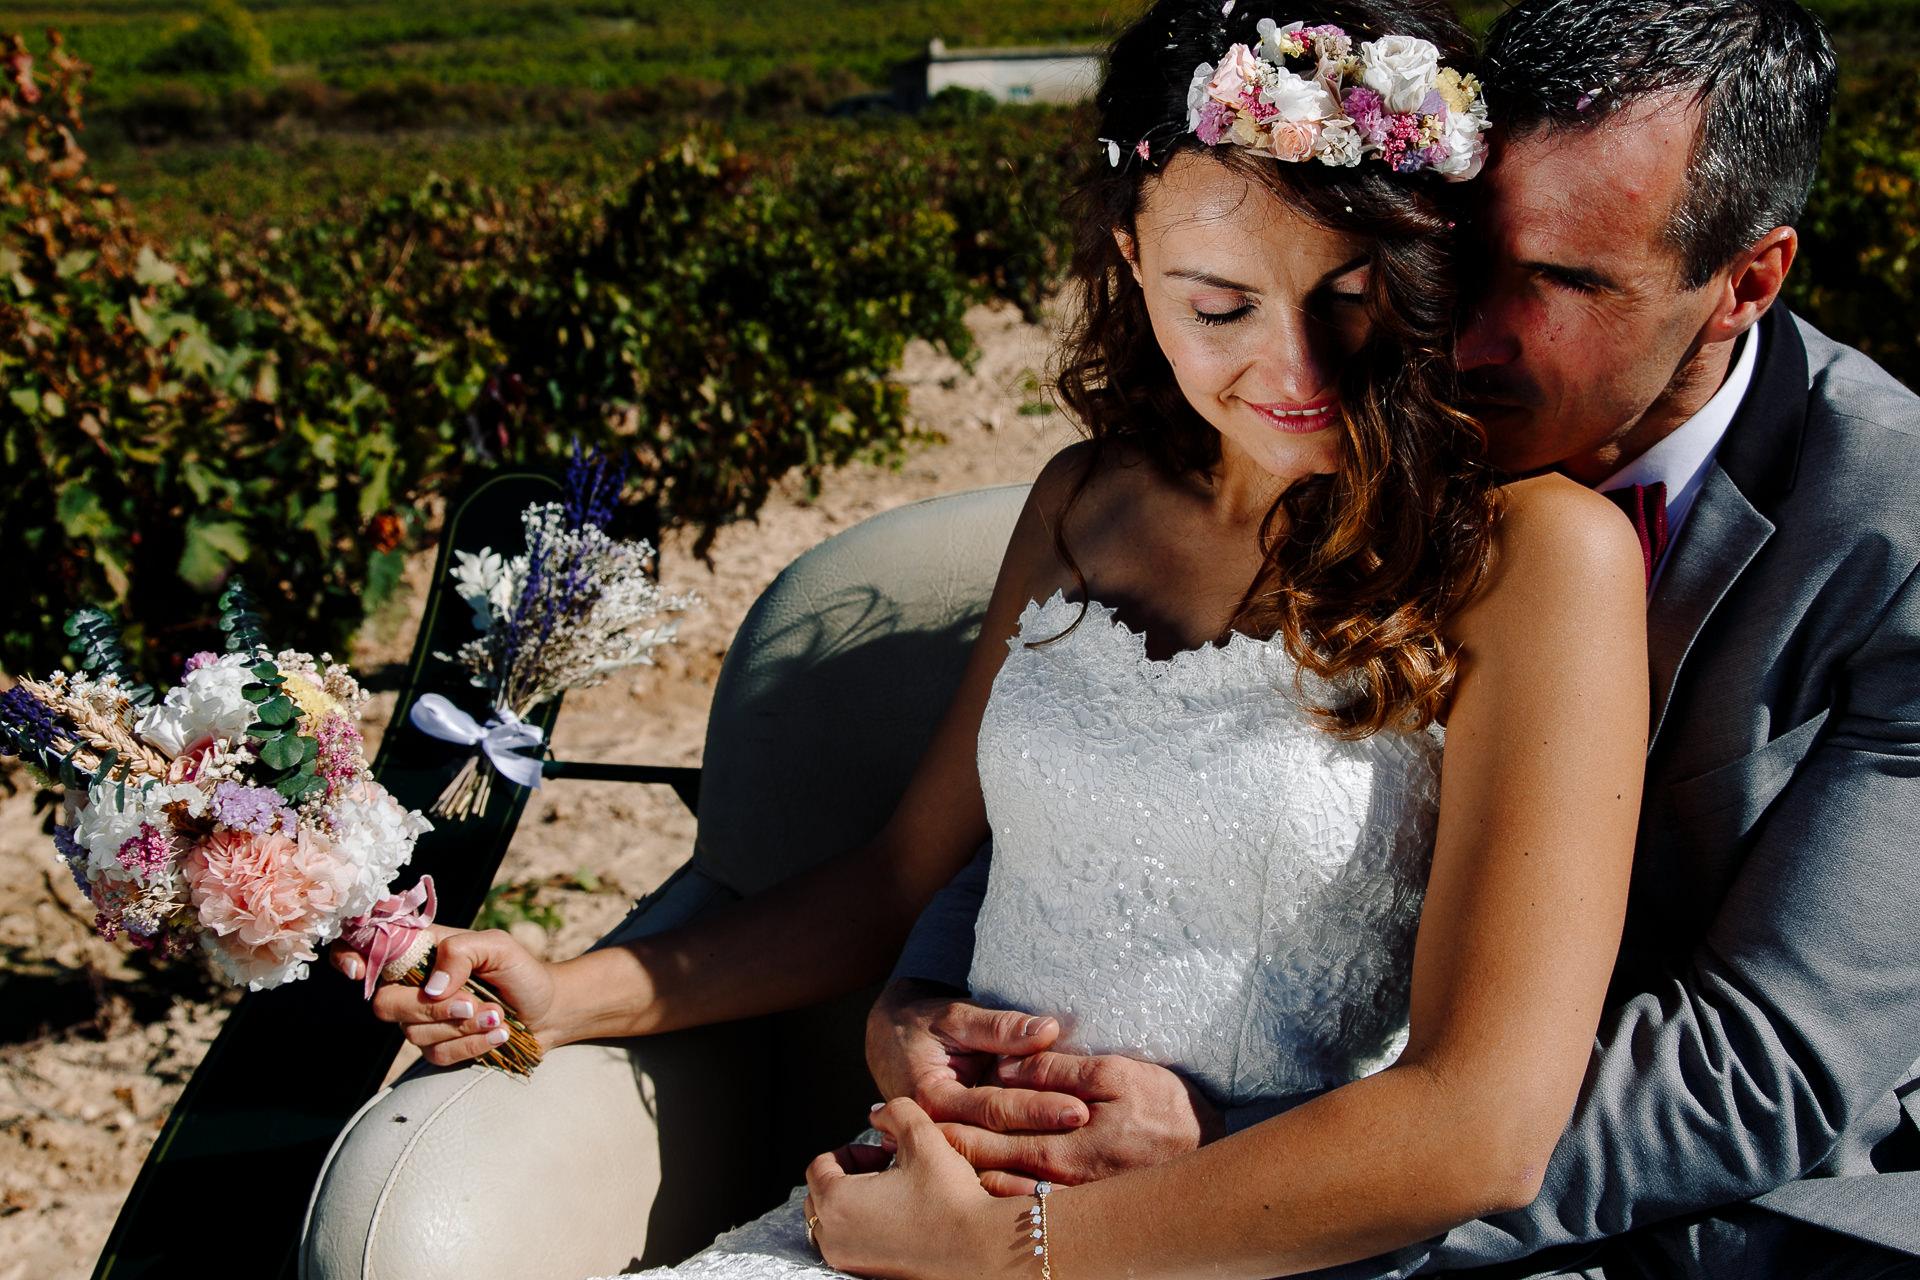 boda civil vinedos larioja lola berantevilla 142136